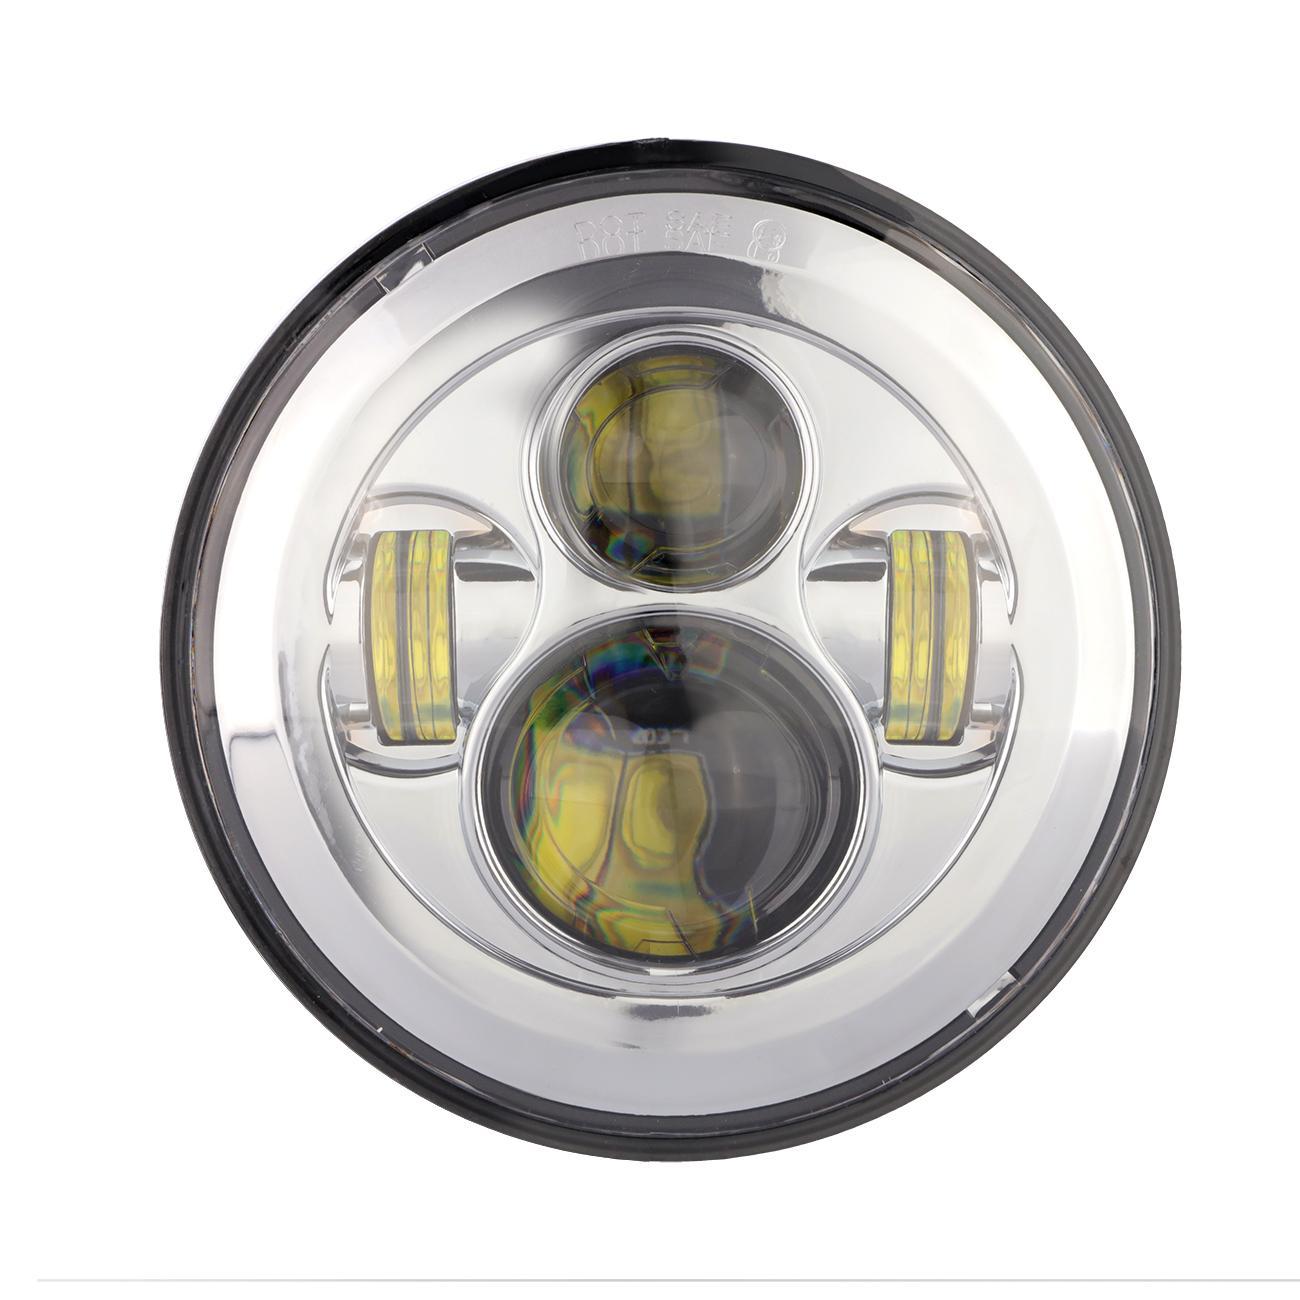 7 U0026quot  Led Headlight Bulb 150w Chrome Lamp For Honda Shadow